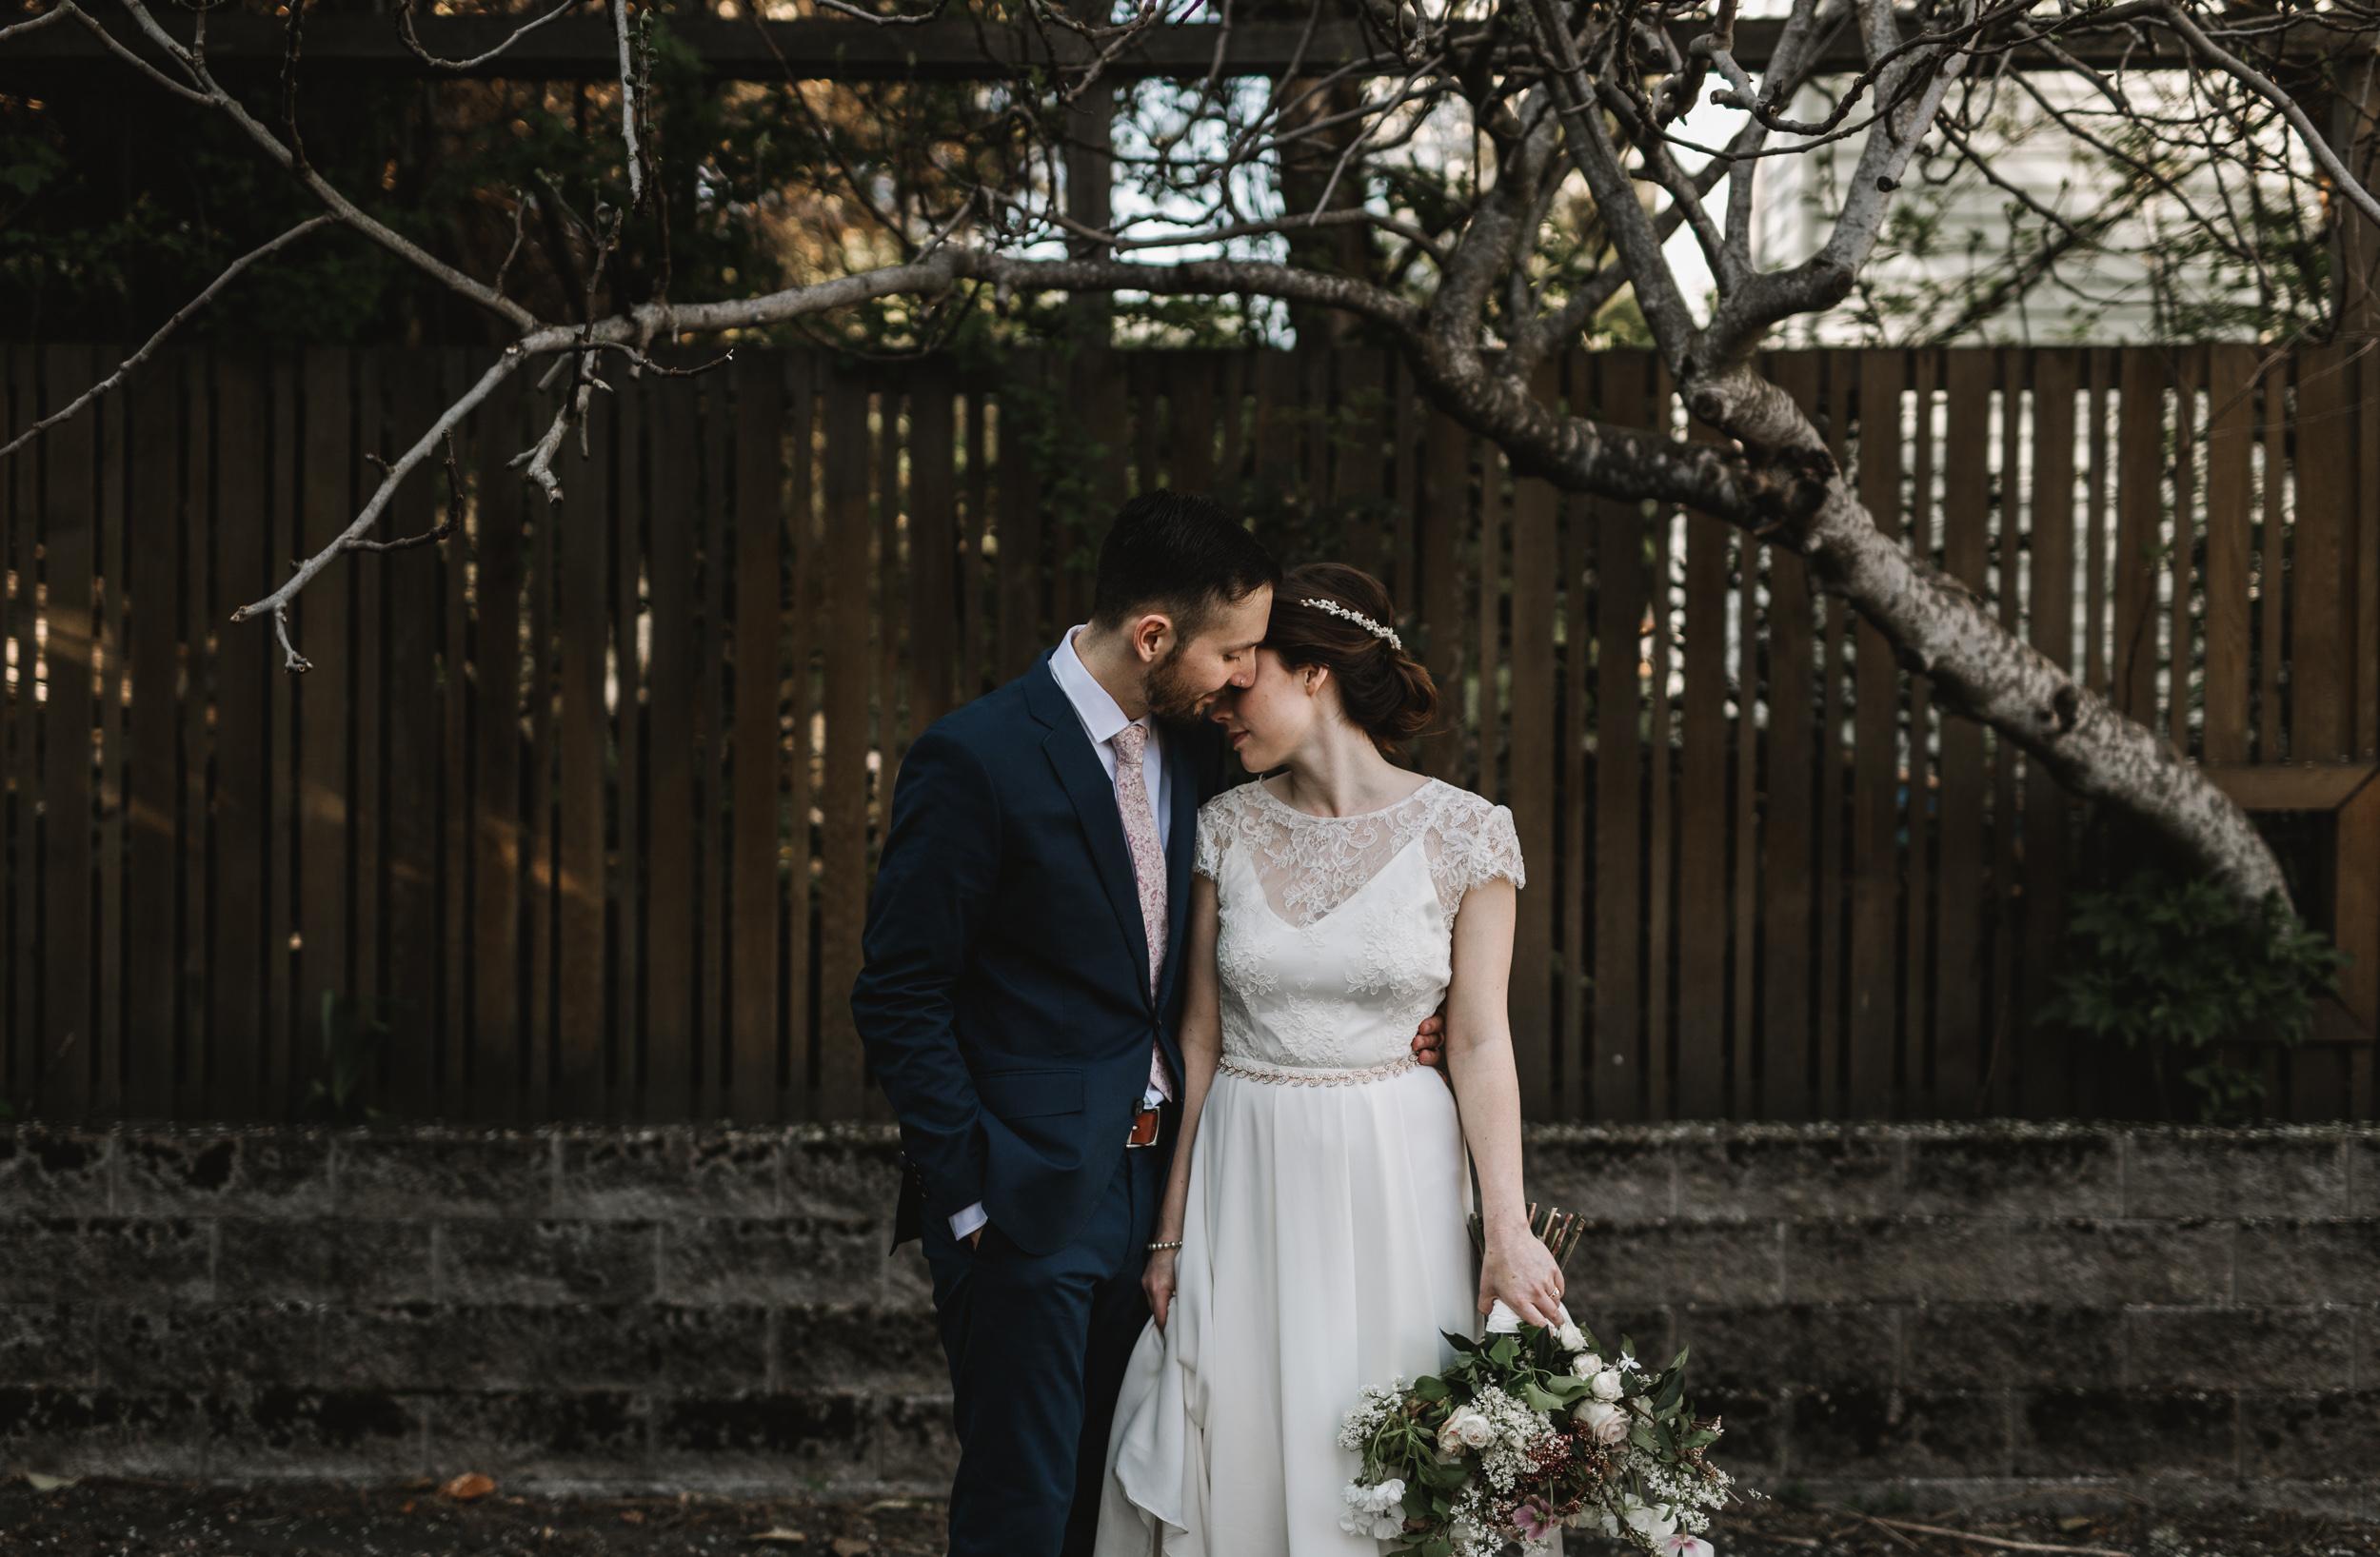 door-of-hope-wedding-portland-artistic-wedding-photography-2164.jpg